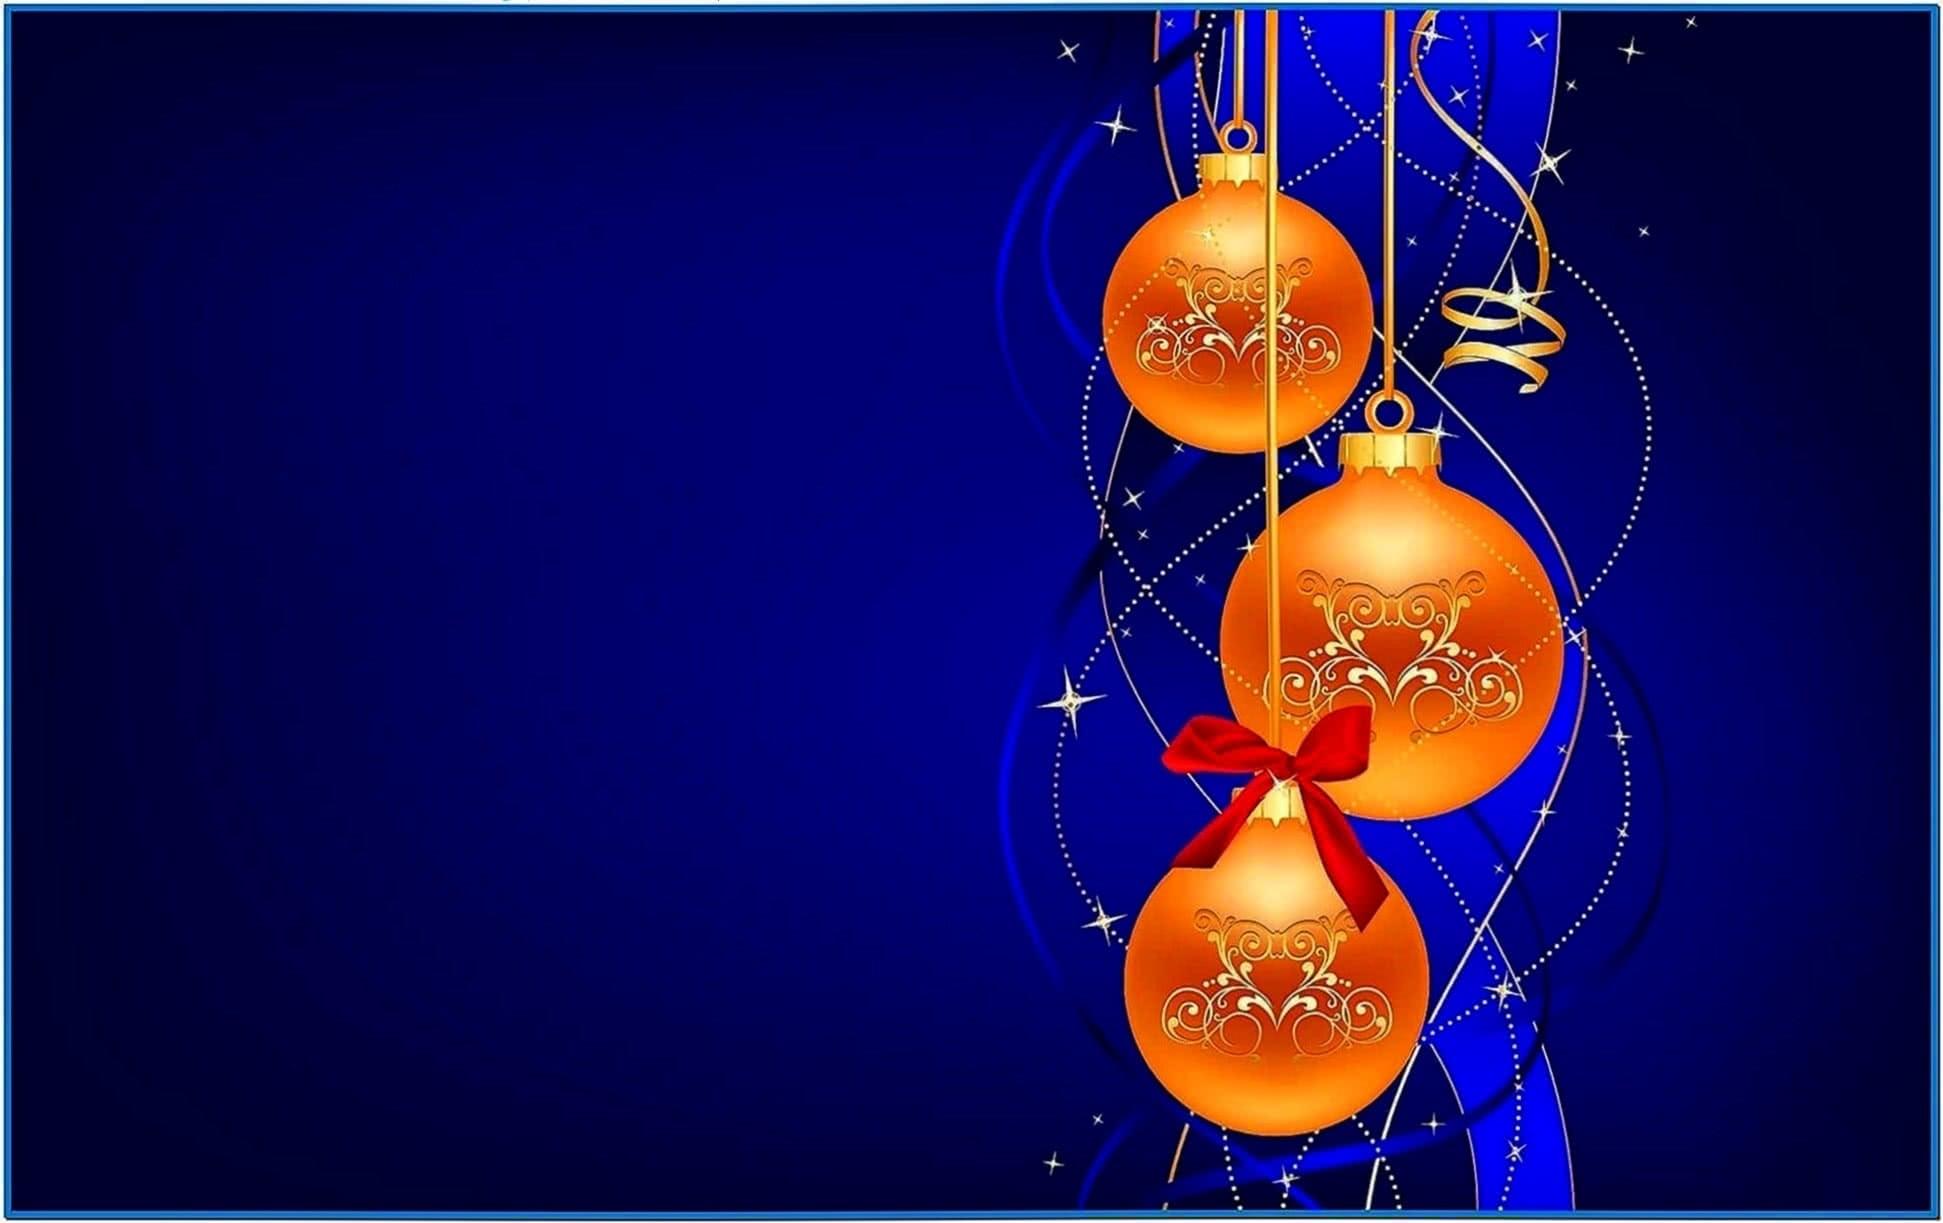 Merry christmas screensaver windows 7 - Download free